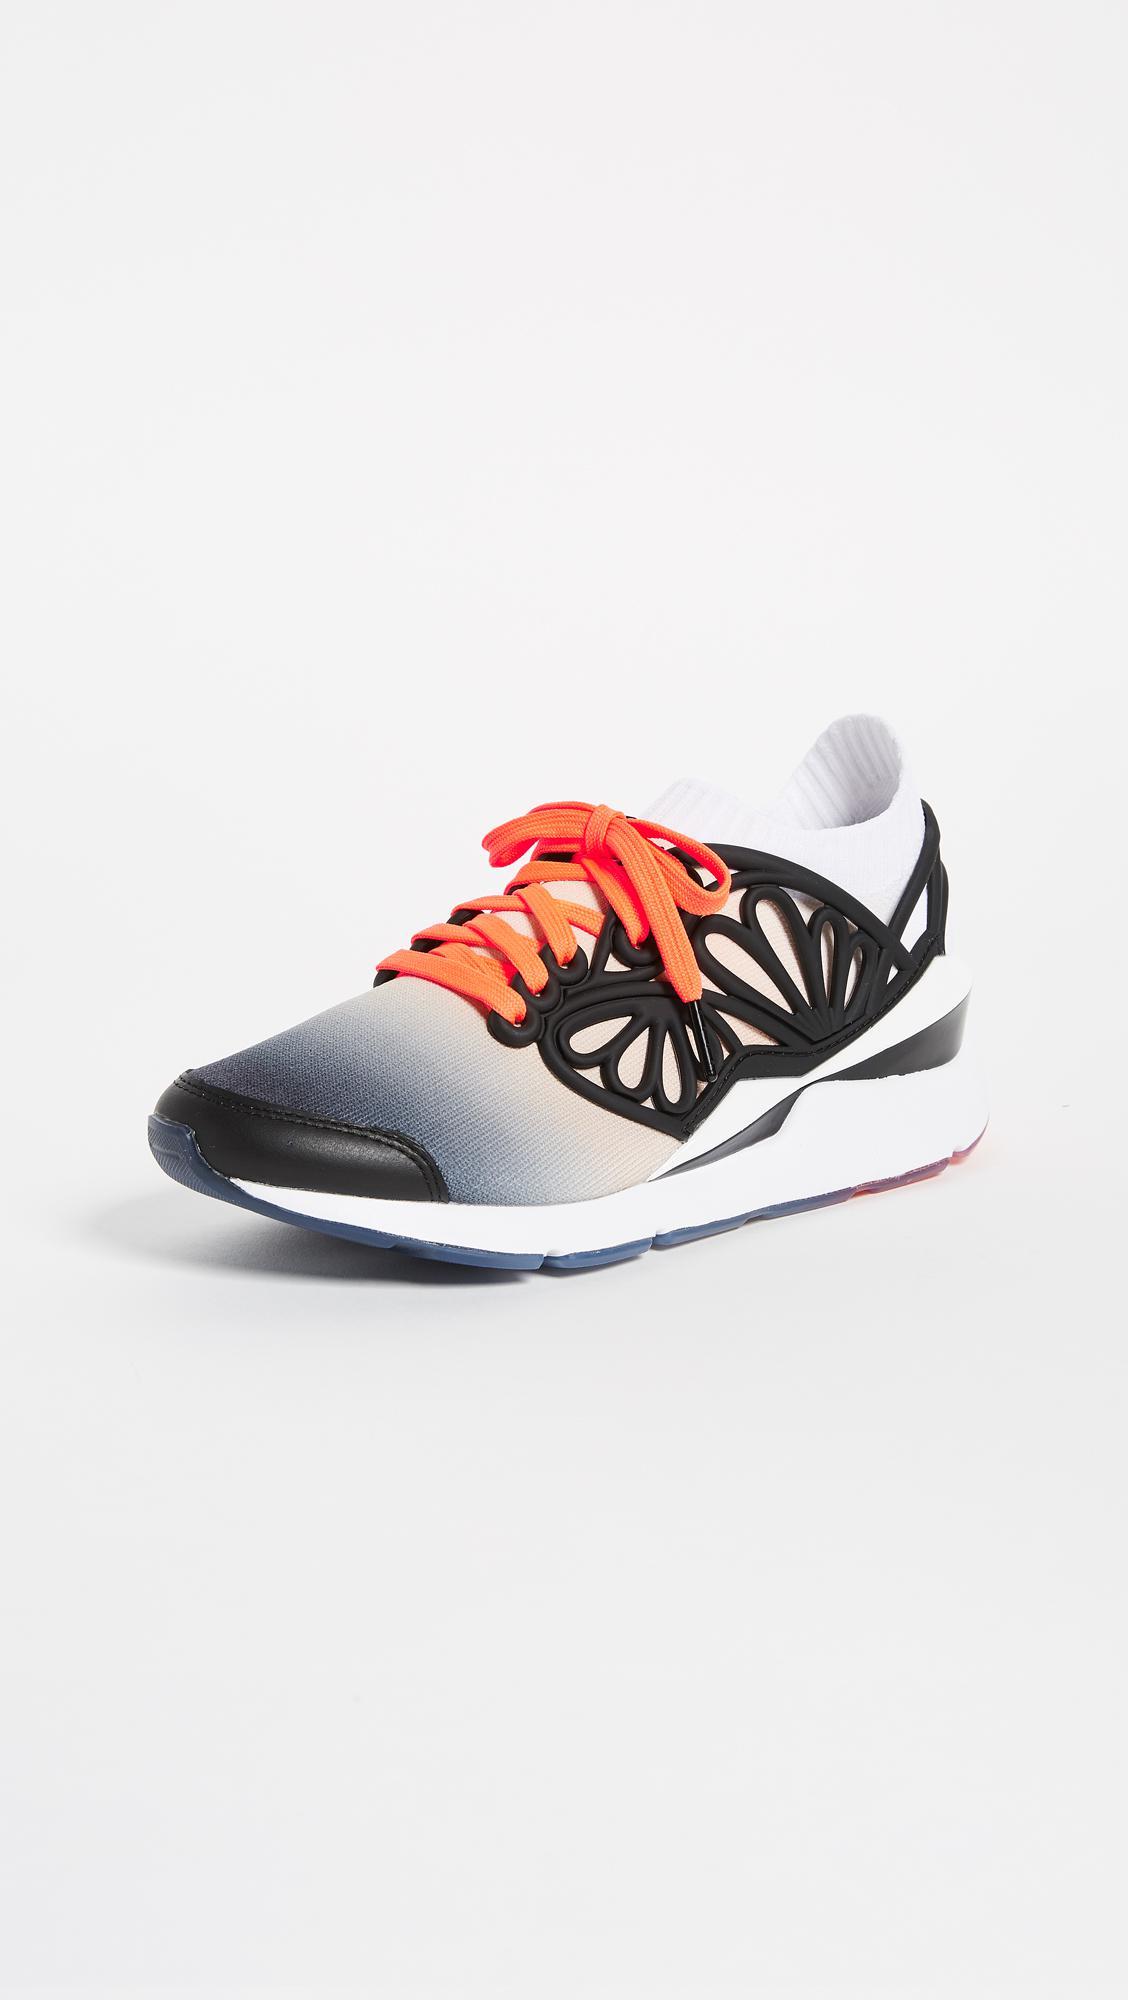 9d7b5c535903 Lyst - PUMA X Sophia Webster Cage Fade Sneakers